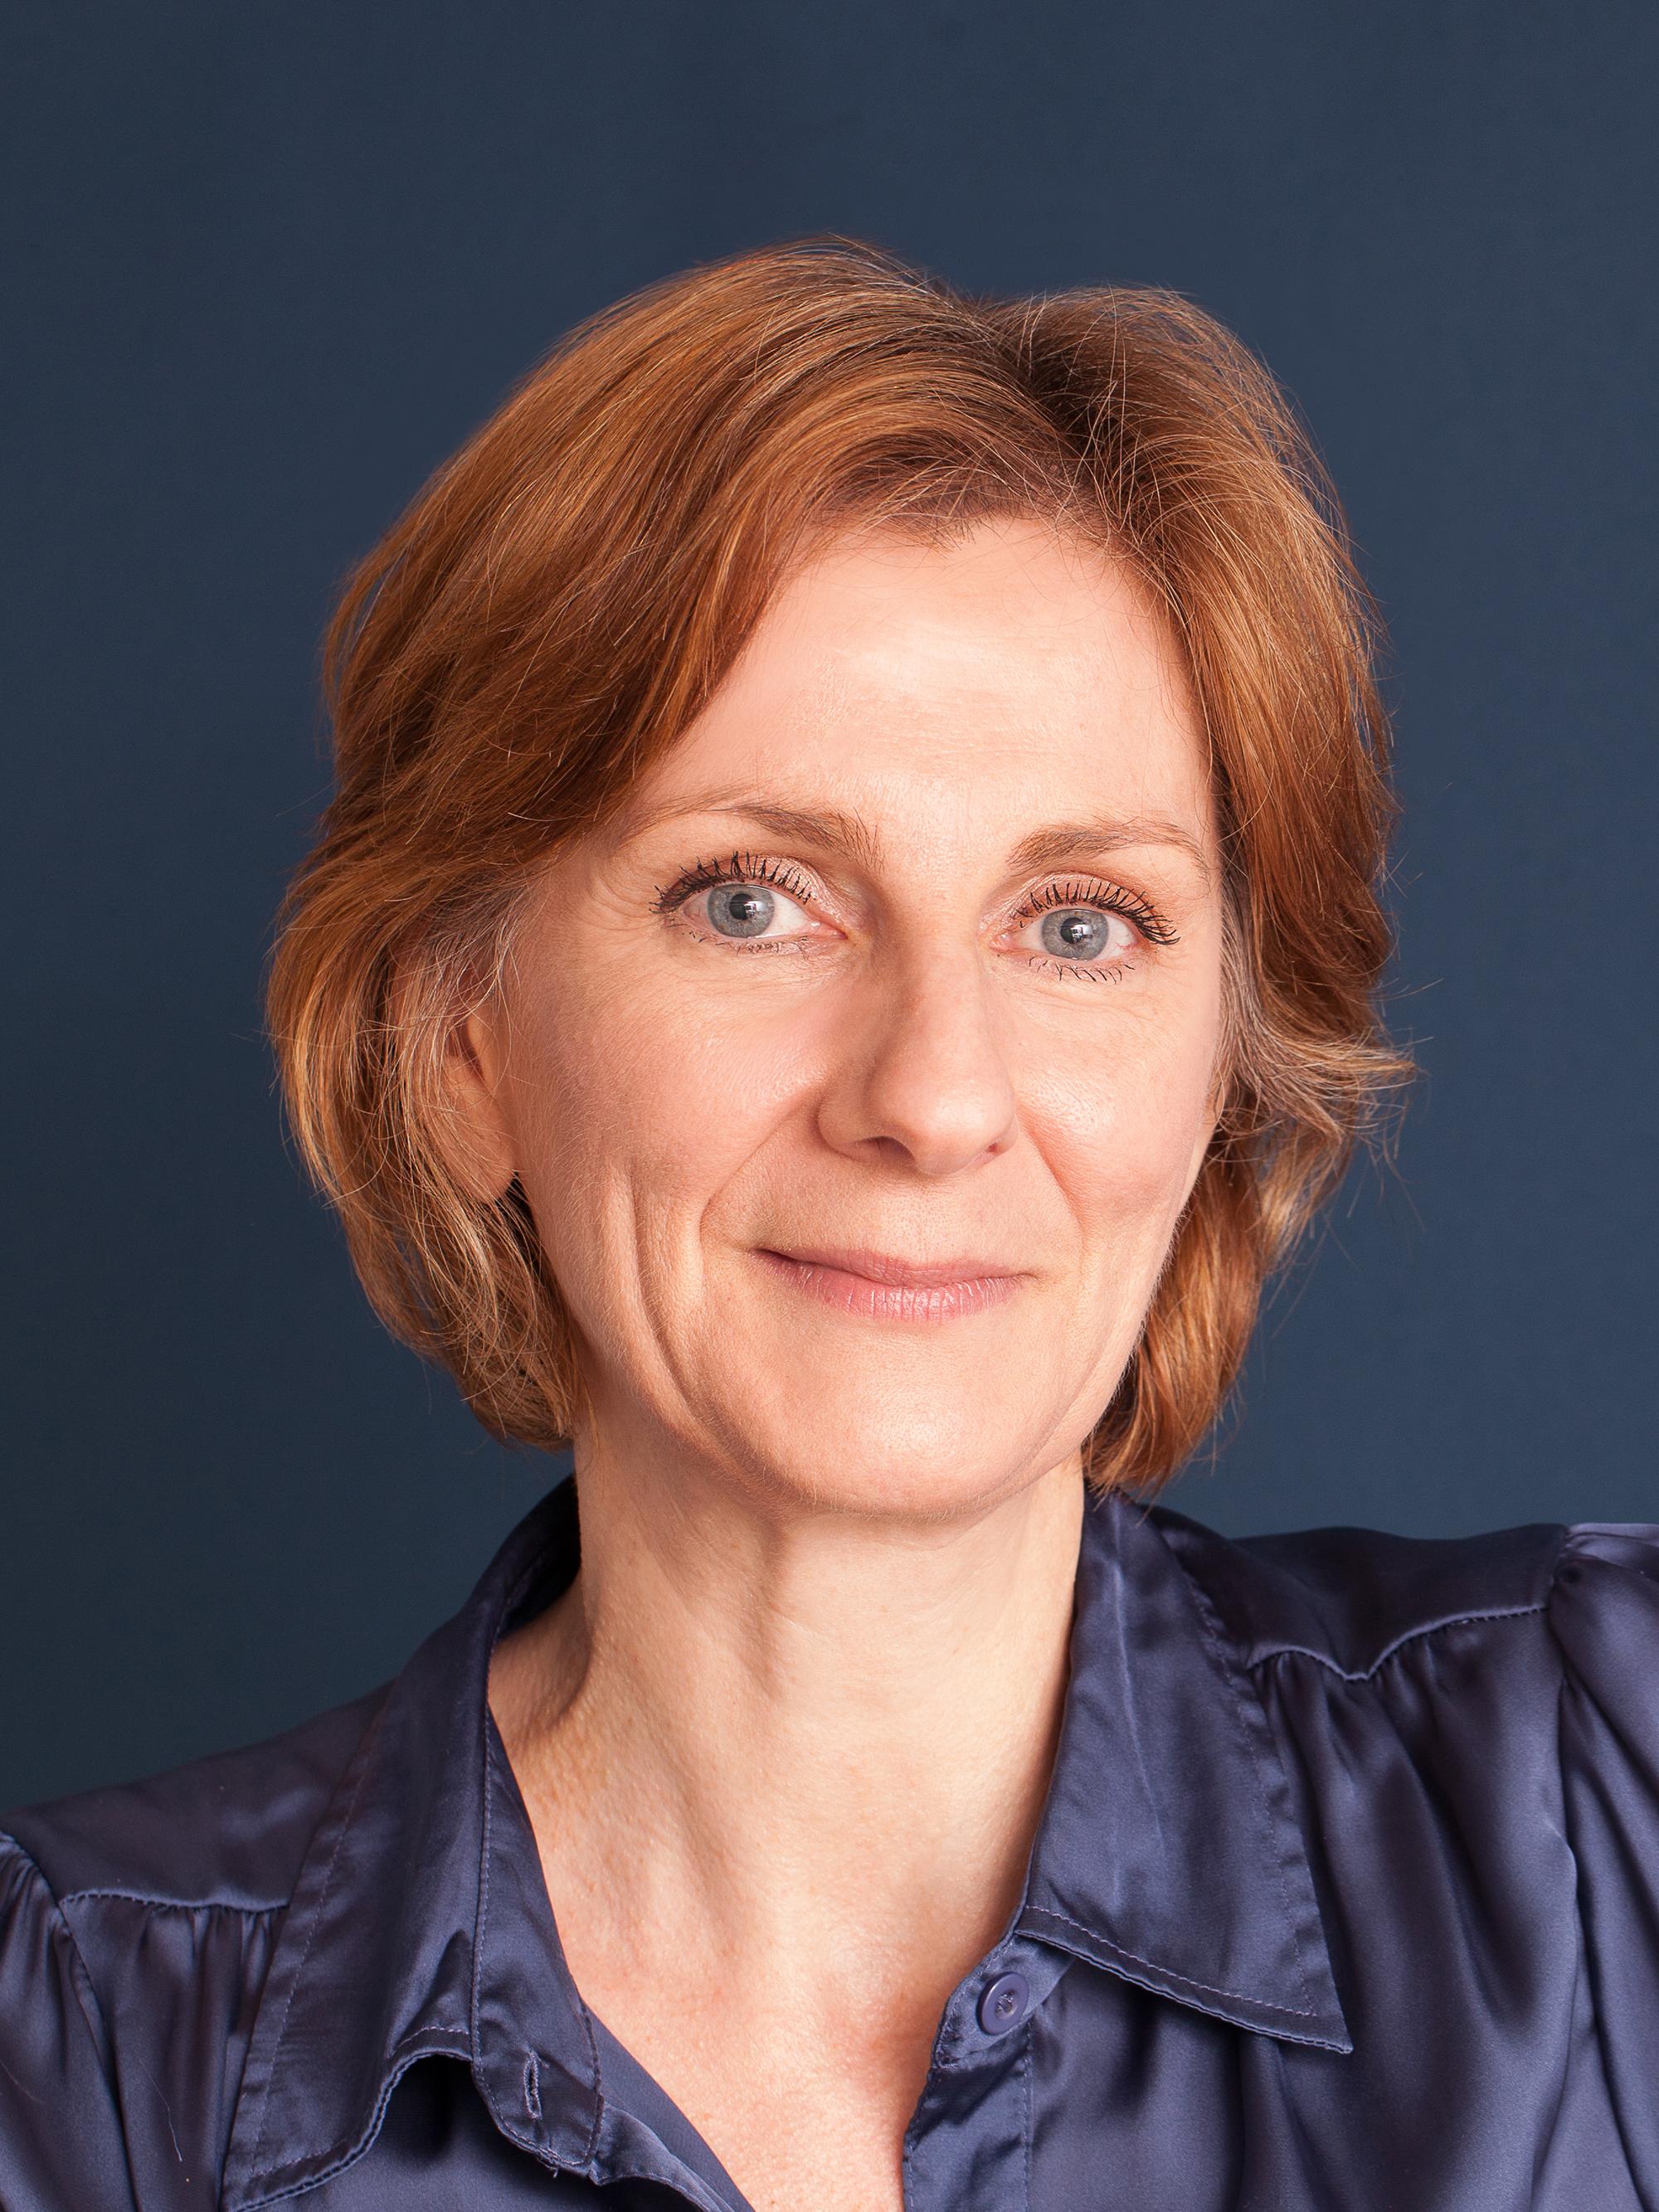 Sarah Utterback,Leah Hackett (born 1985) Hot tube Patricia Routledge,Justin Bradley